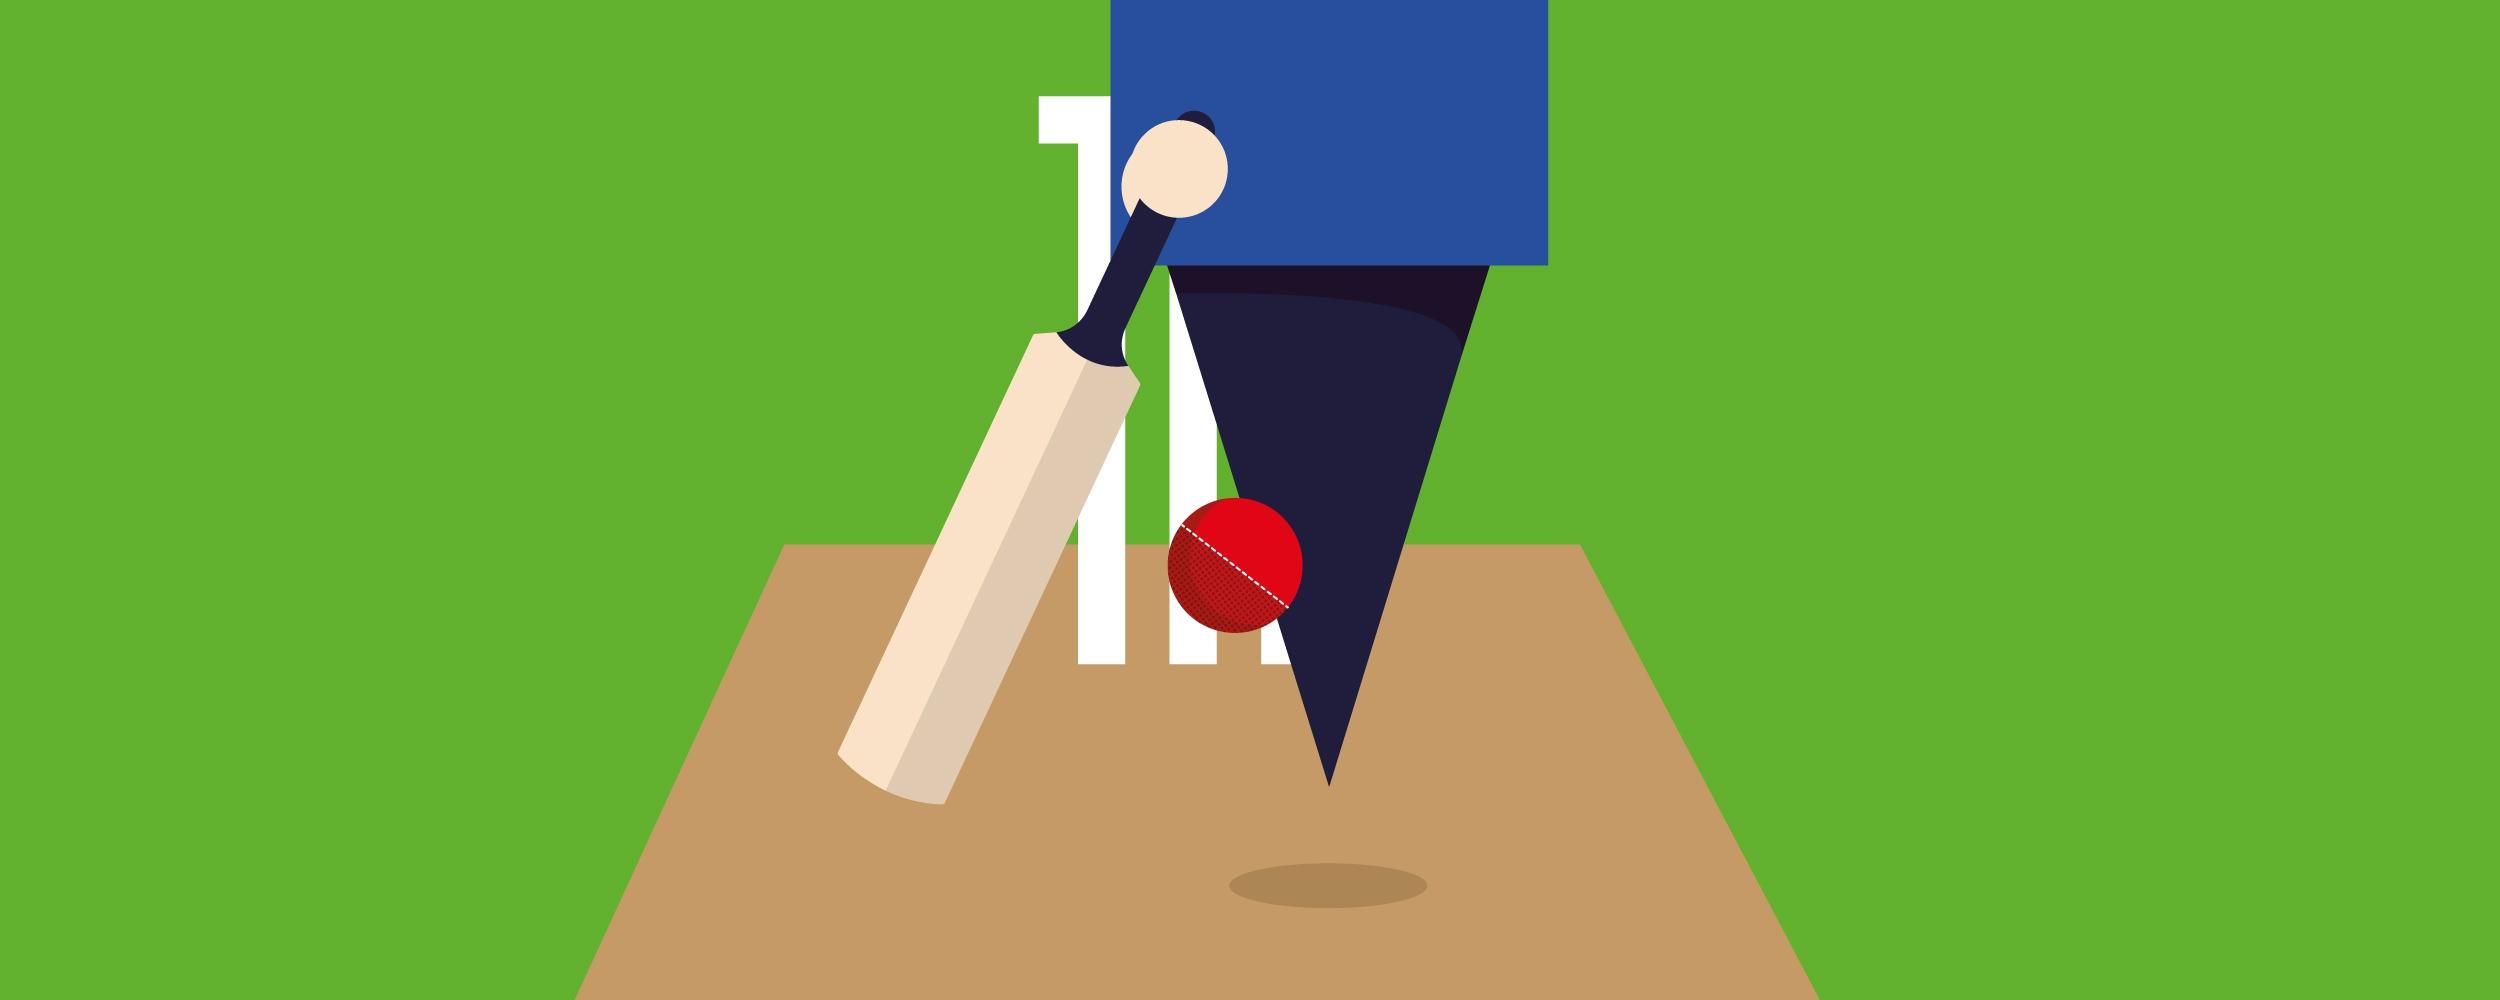 Leg Before Wicket